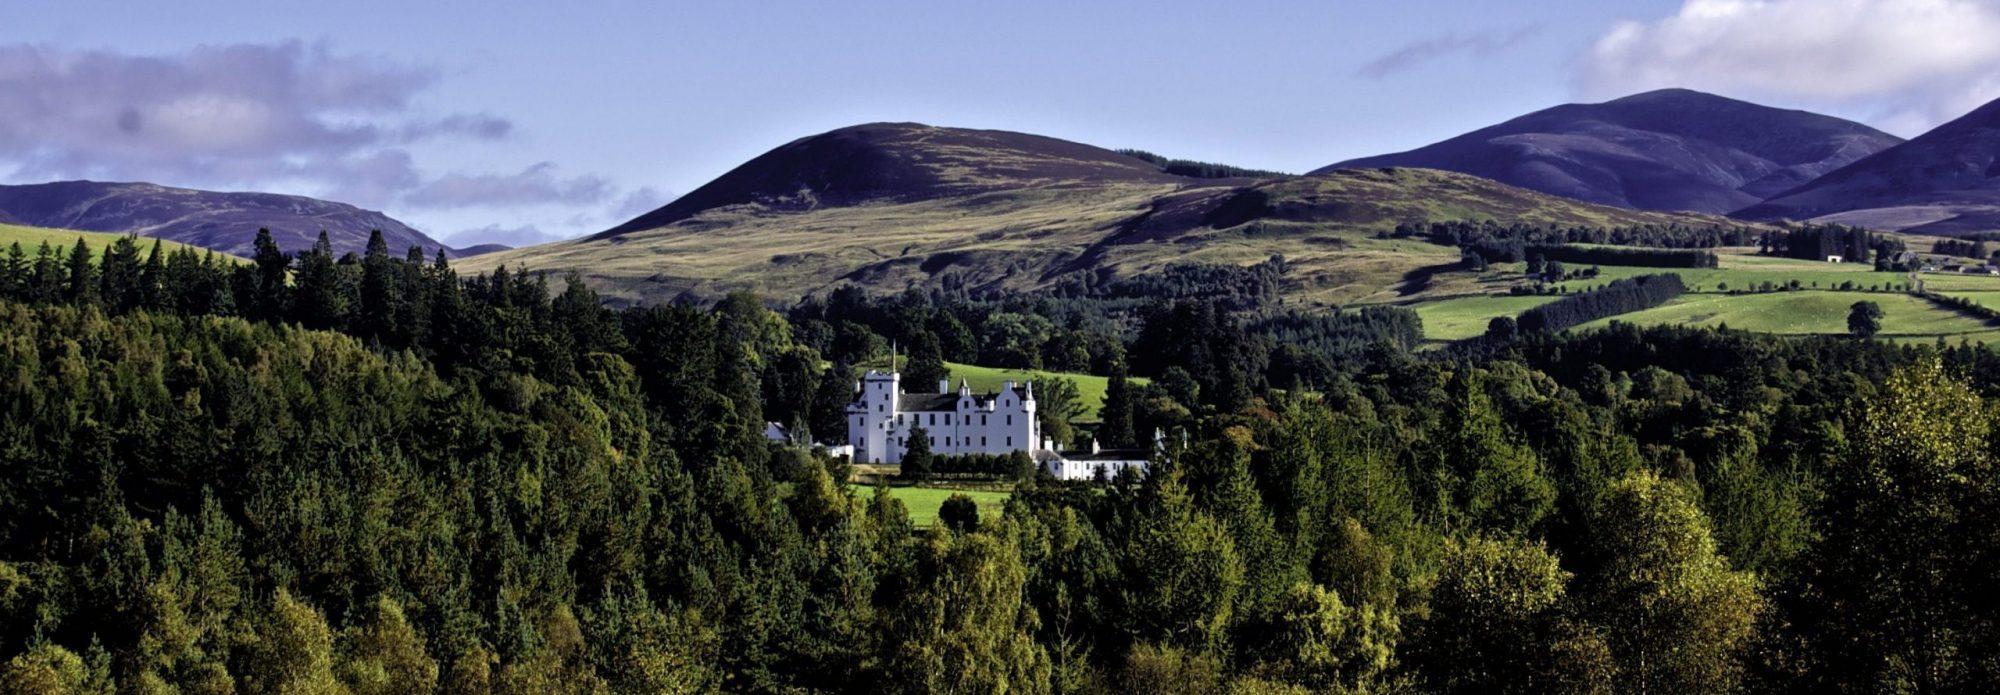 Scenic Blair Castle Panorama Scaled Aspect Ratio X